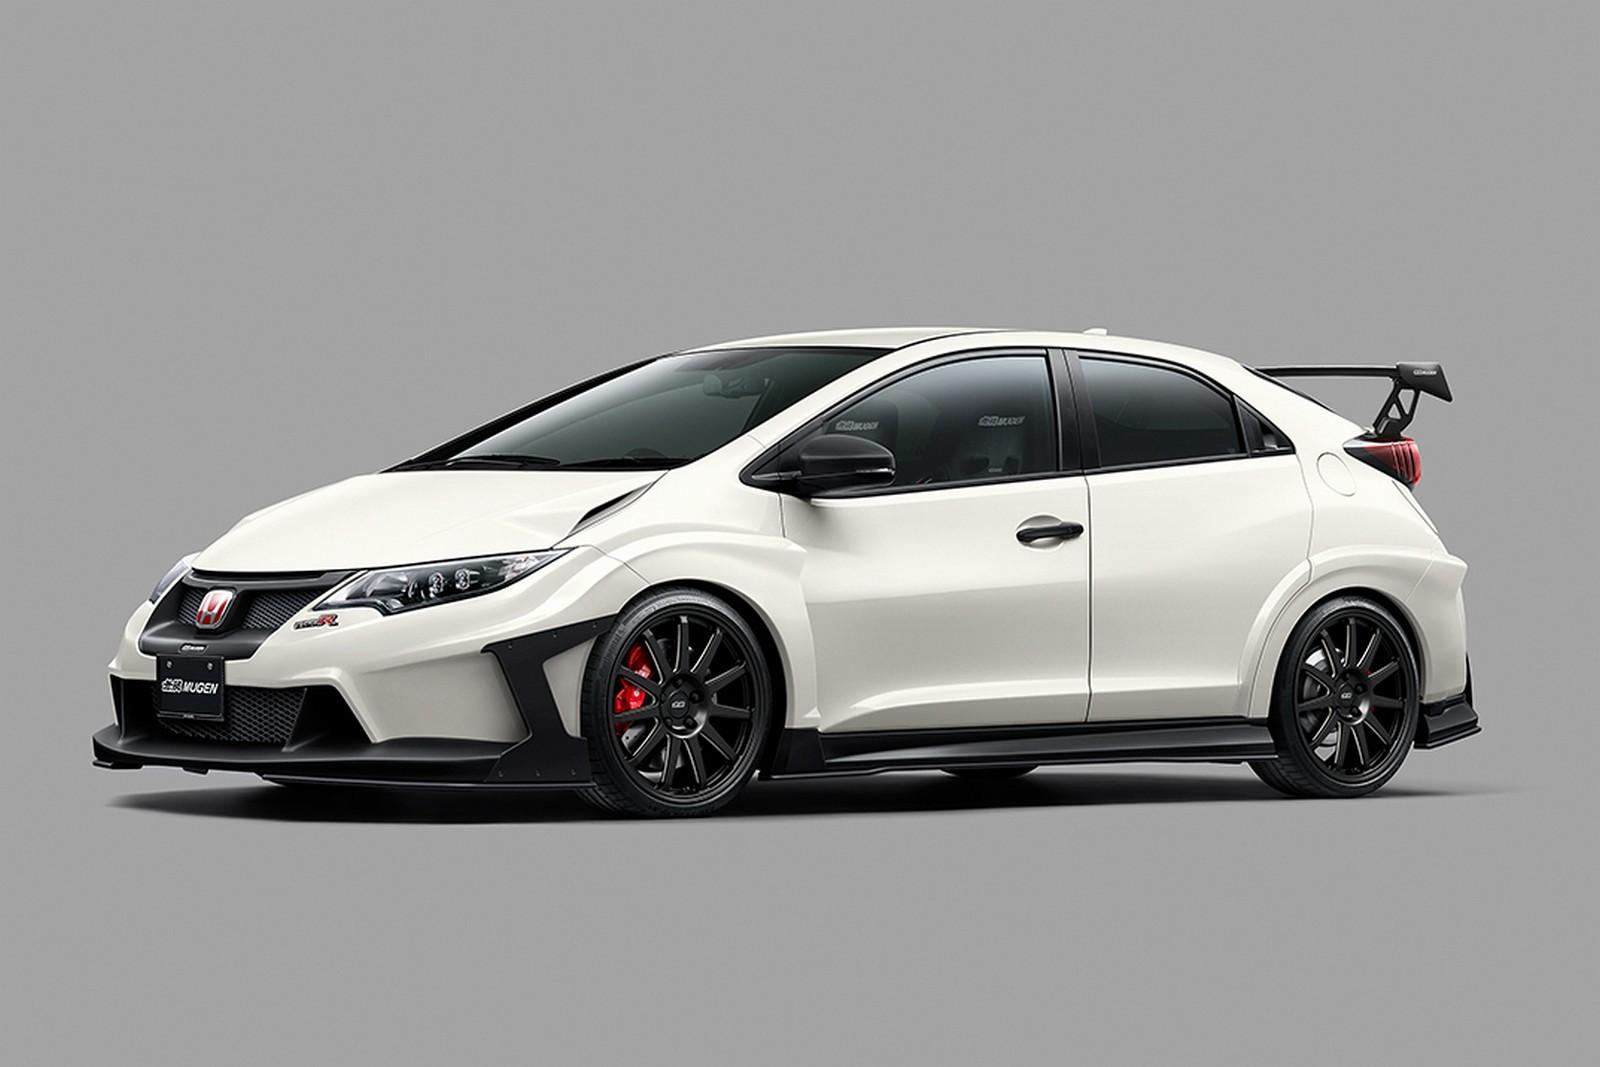 Honda Mugen Civic R